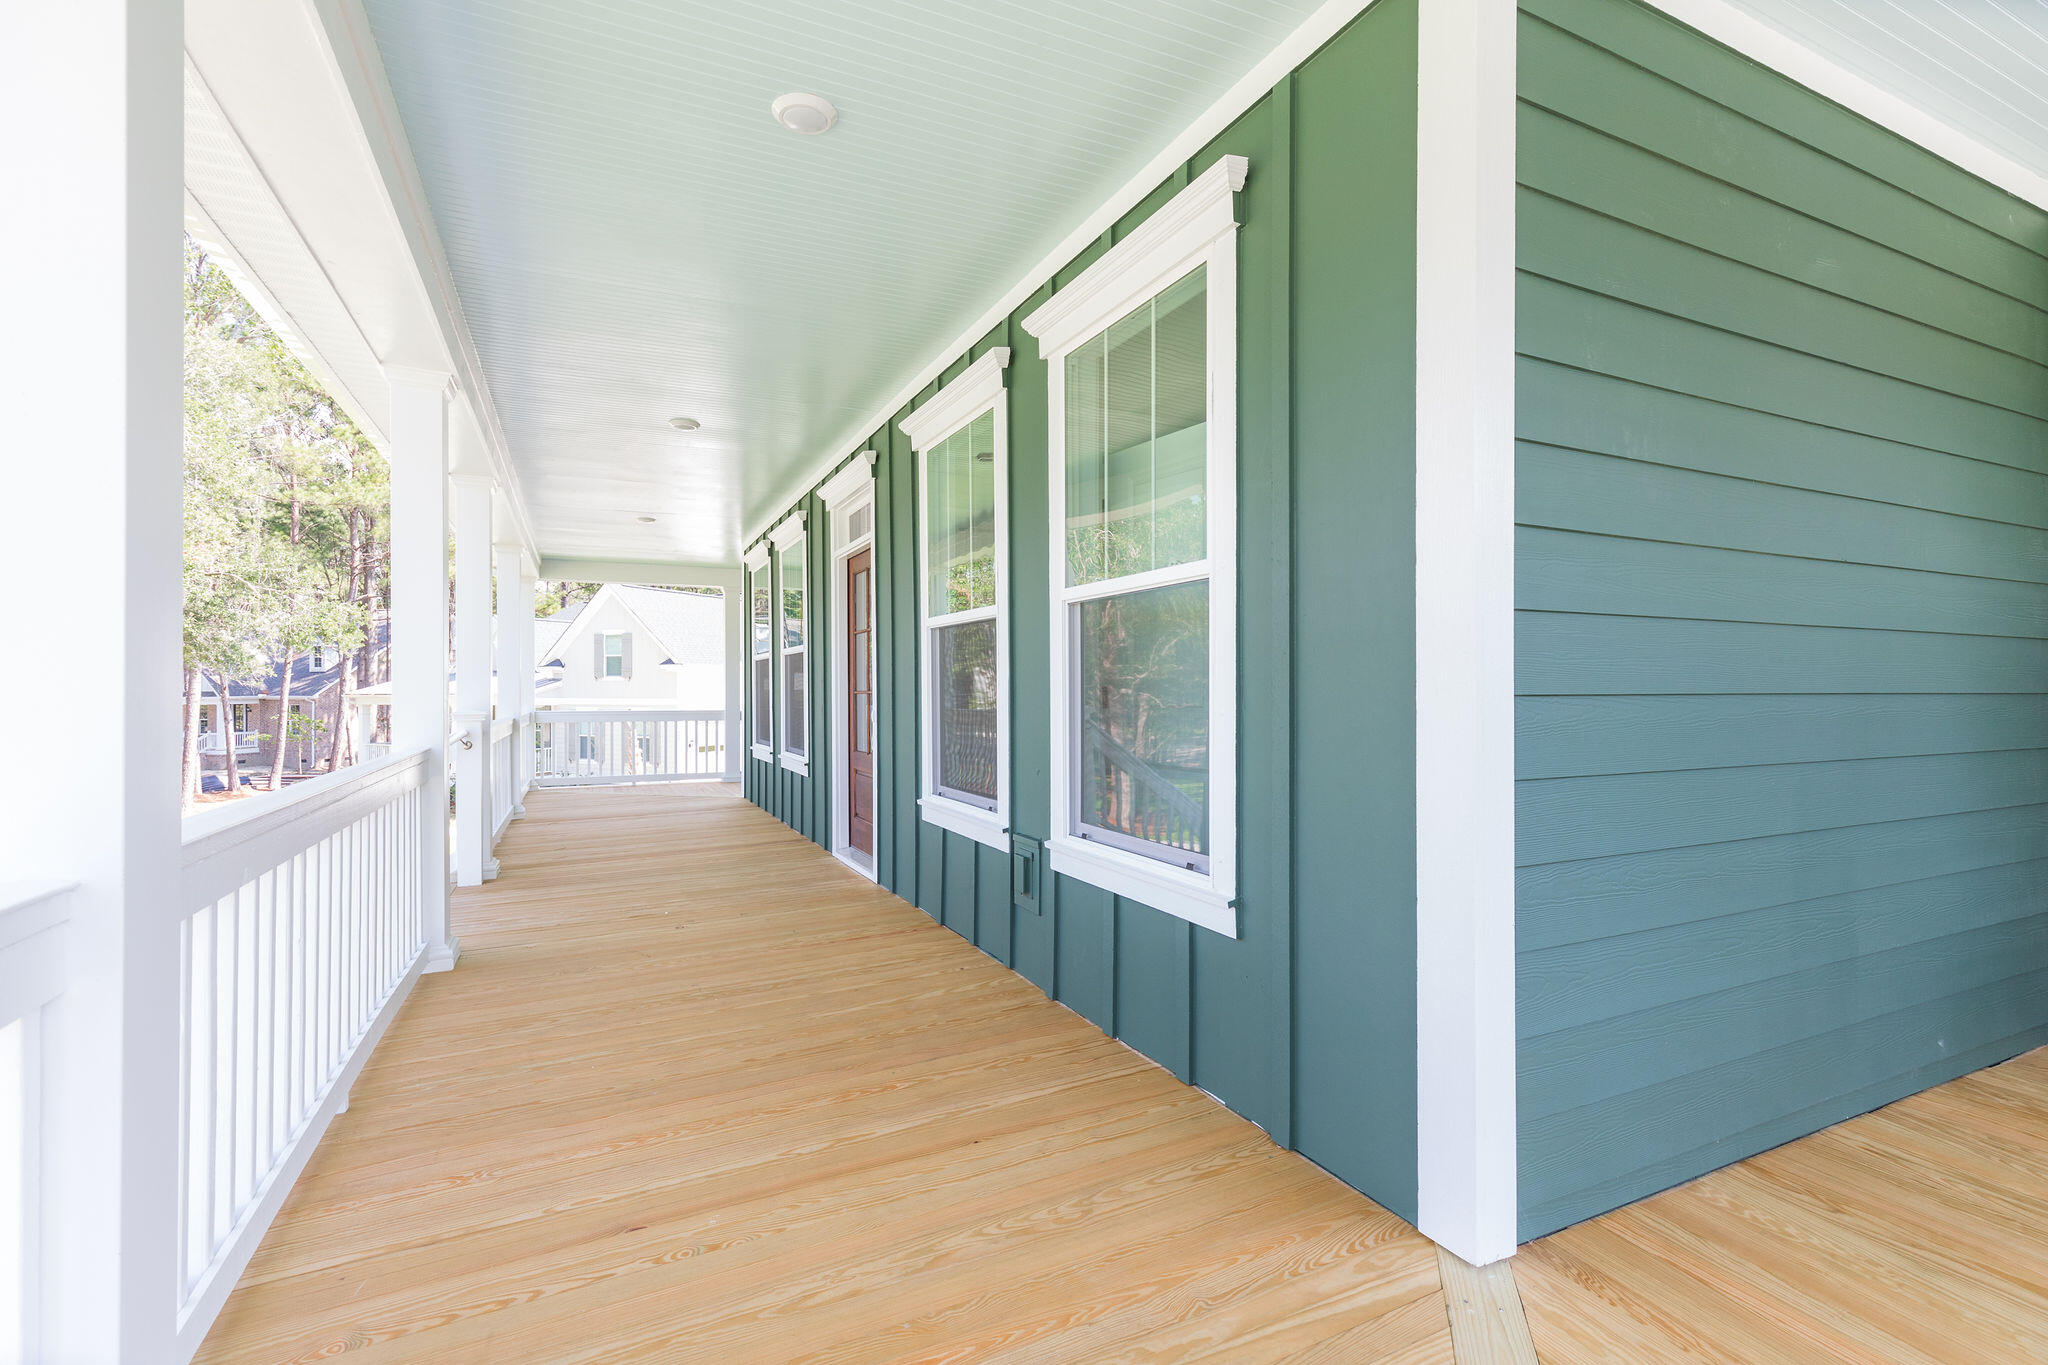 Rushland Plantation Homes For Sale - 2421 Rushland Landing, Johns Island, SC - 6